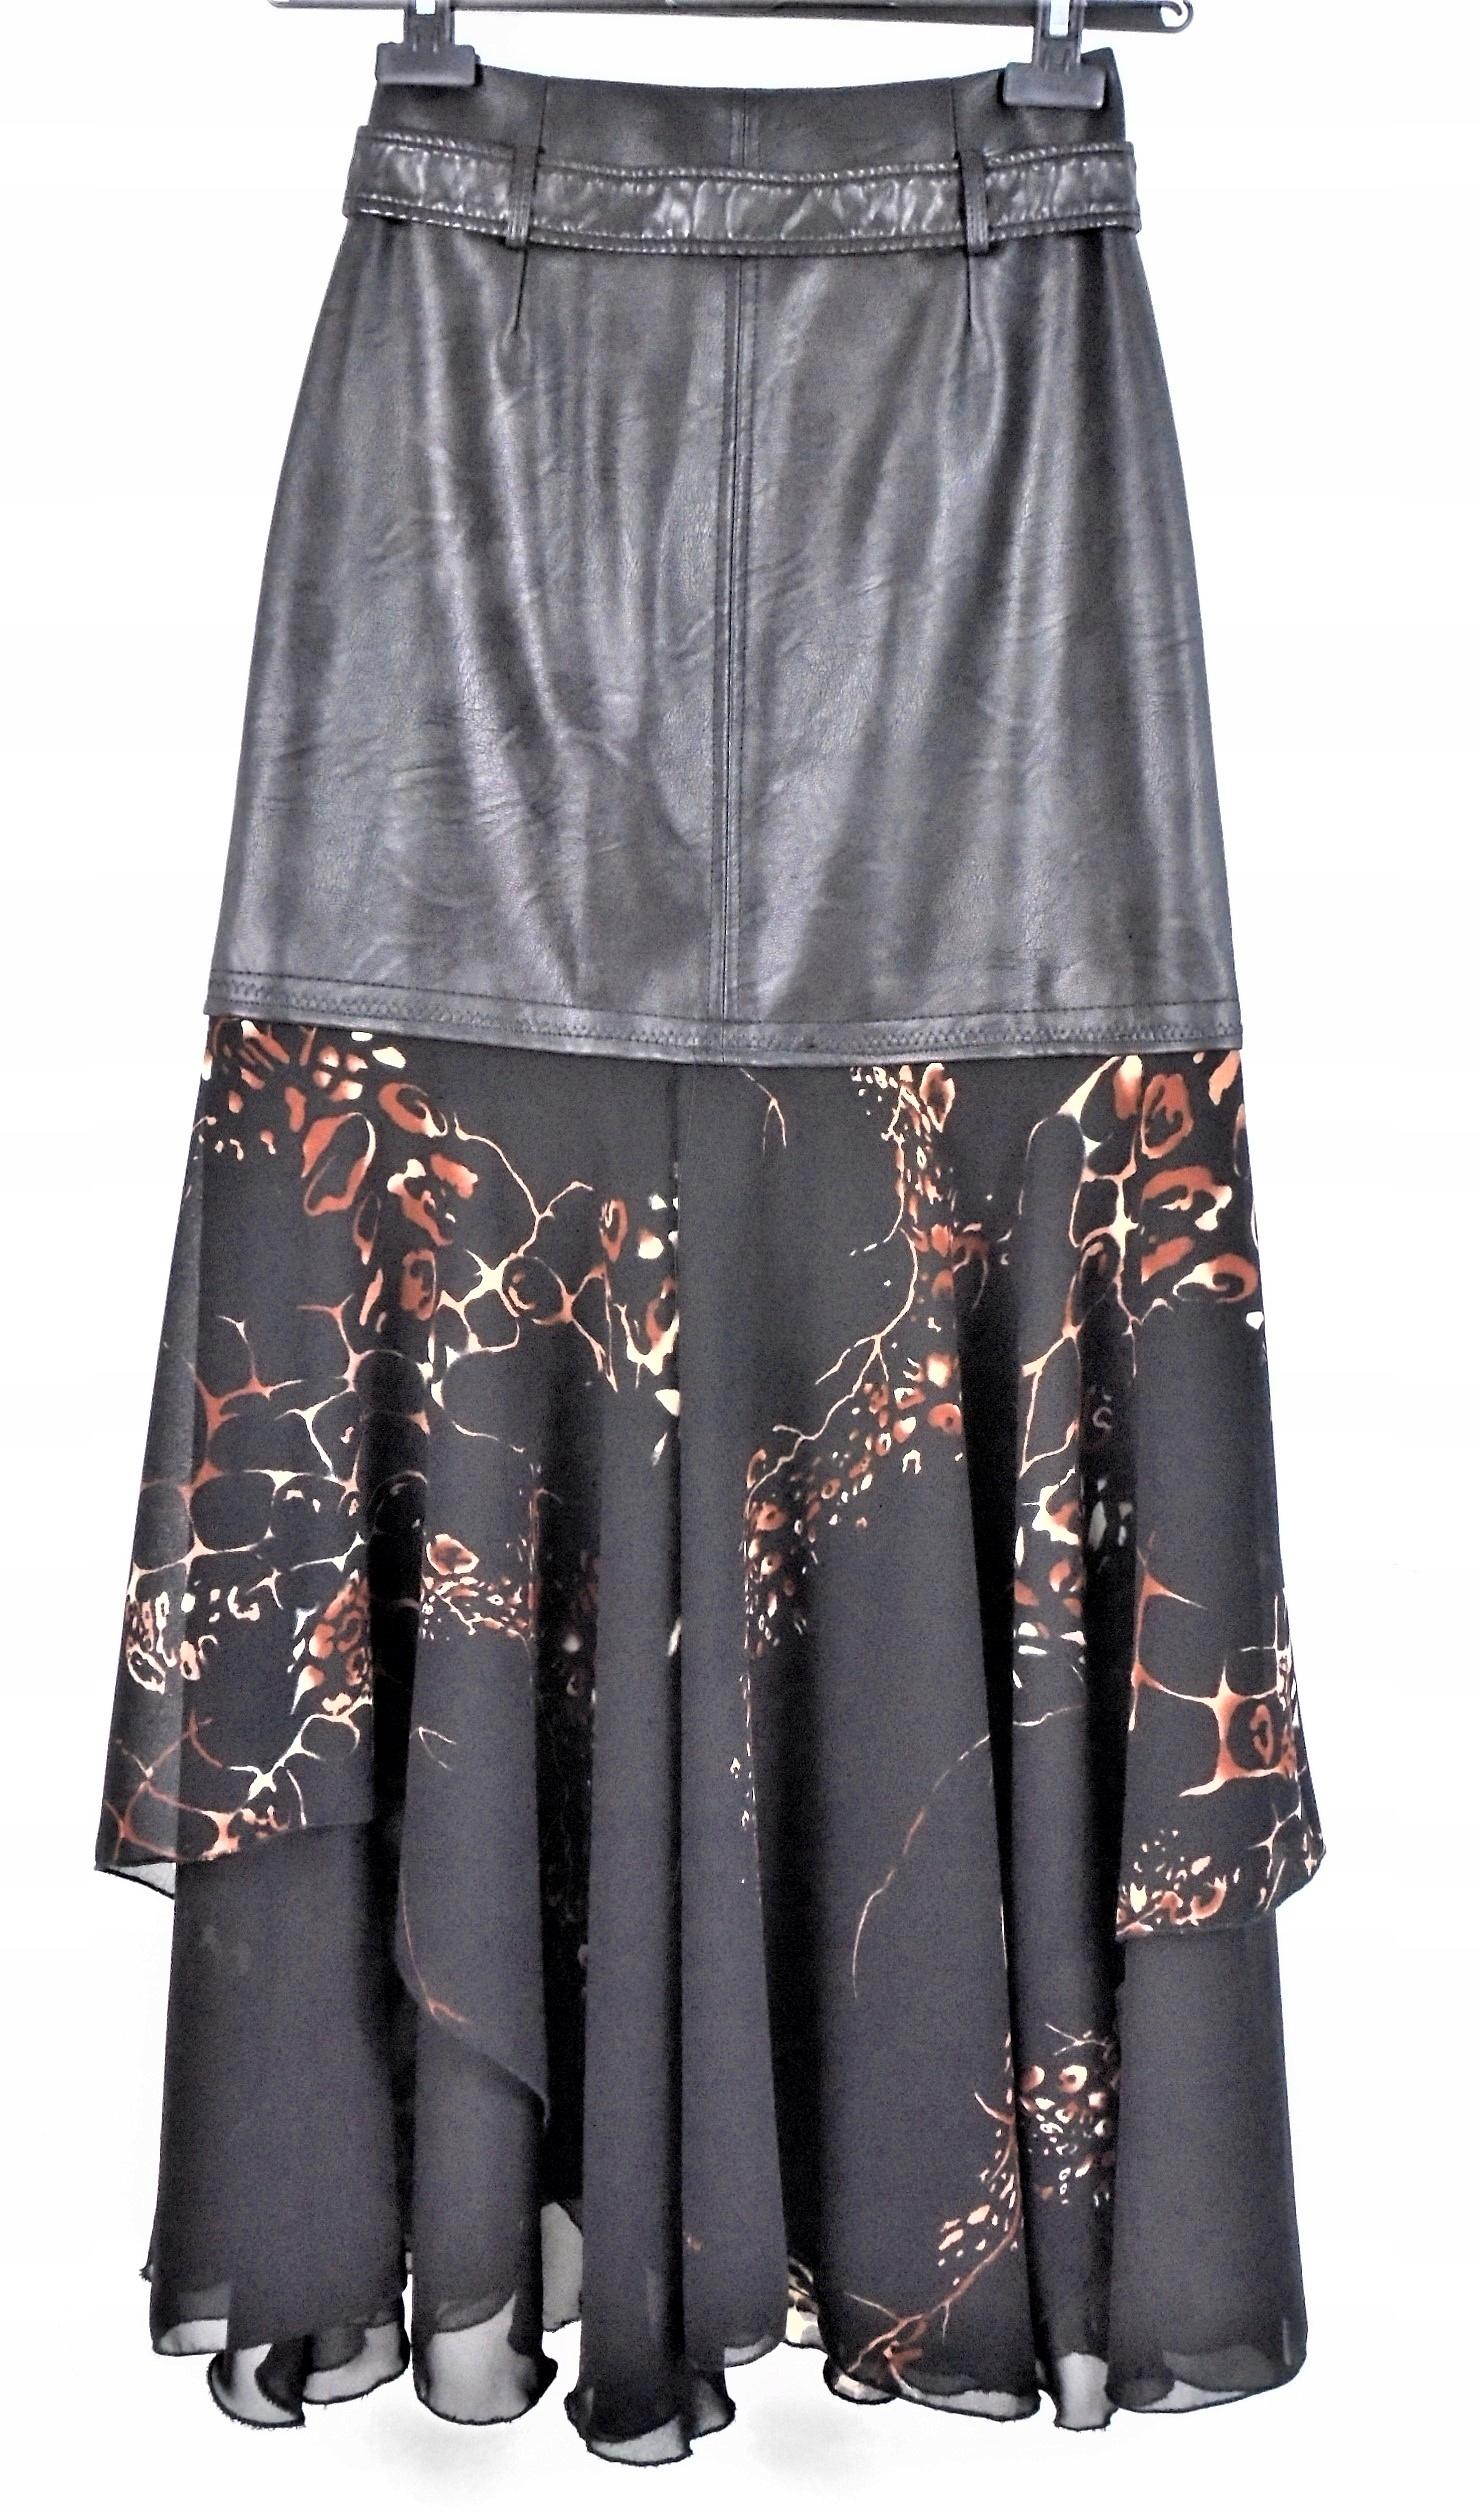 Długa spódnica eko-skóra tiul żorżeta sztruks R 36